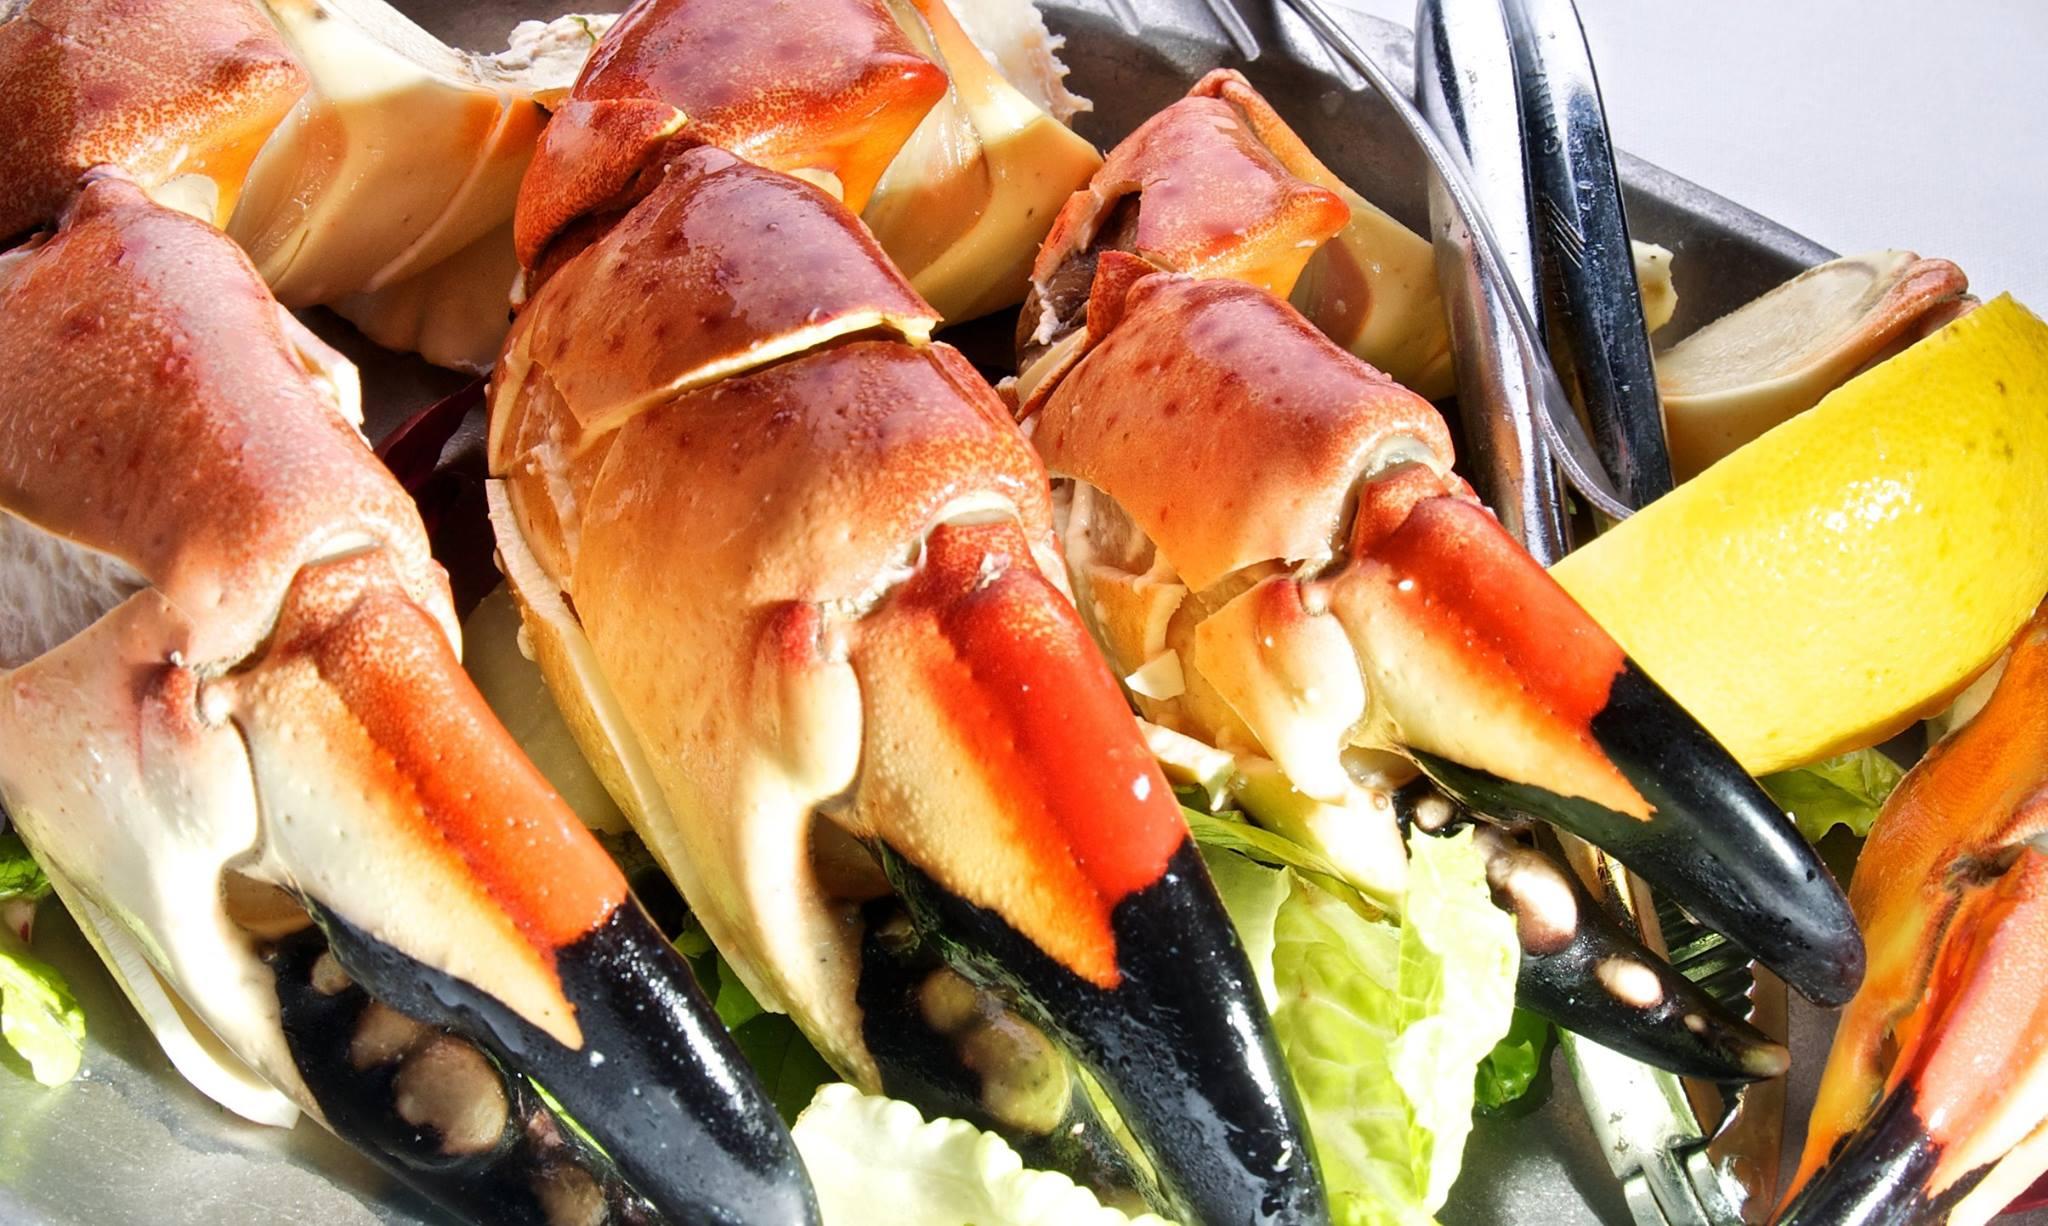 Key_Largo_stone_crabs.jpg